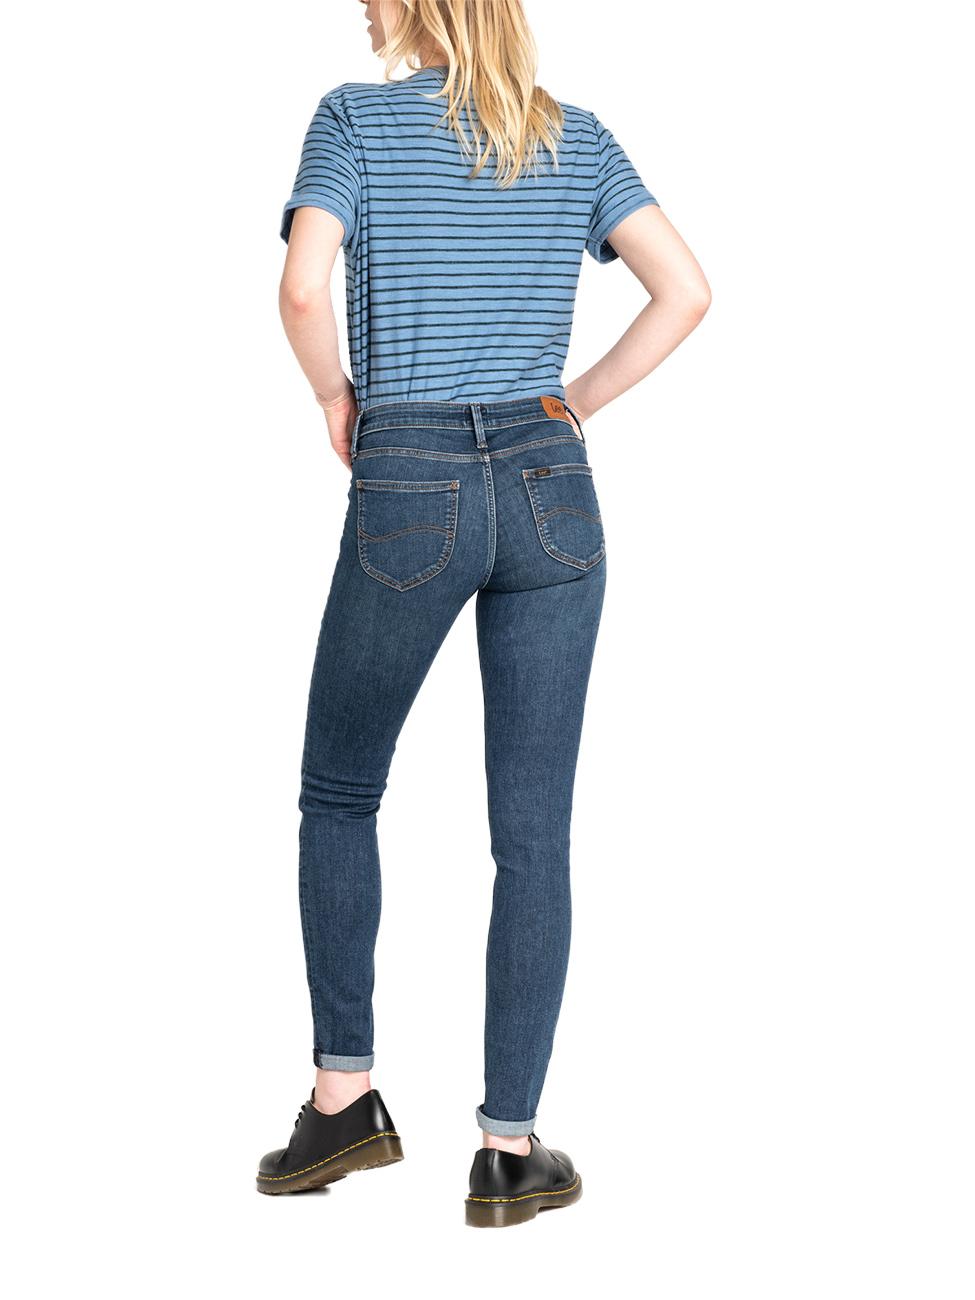 lee-damen-jeans-jeanshose-stretch-scarlett-skinny-fit-blau-dark-ulrich